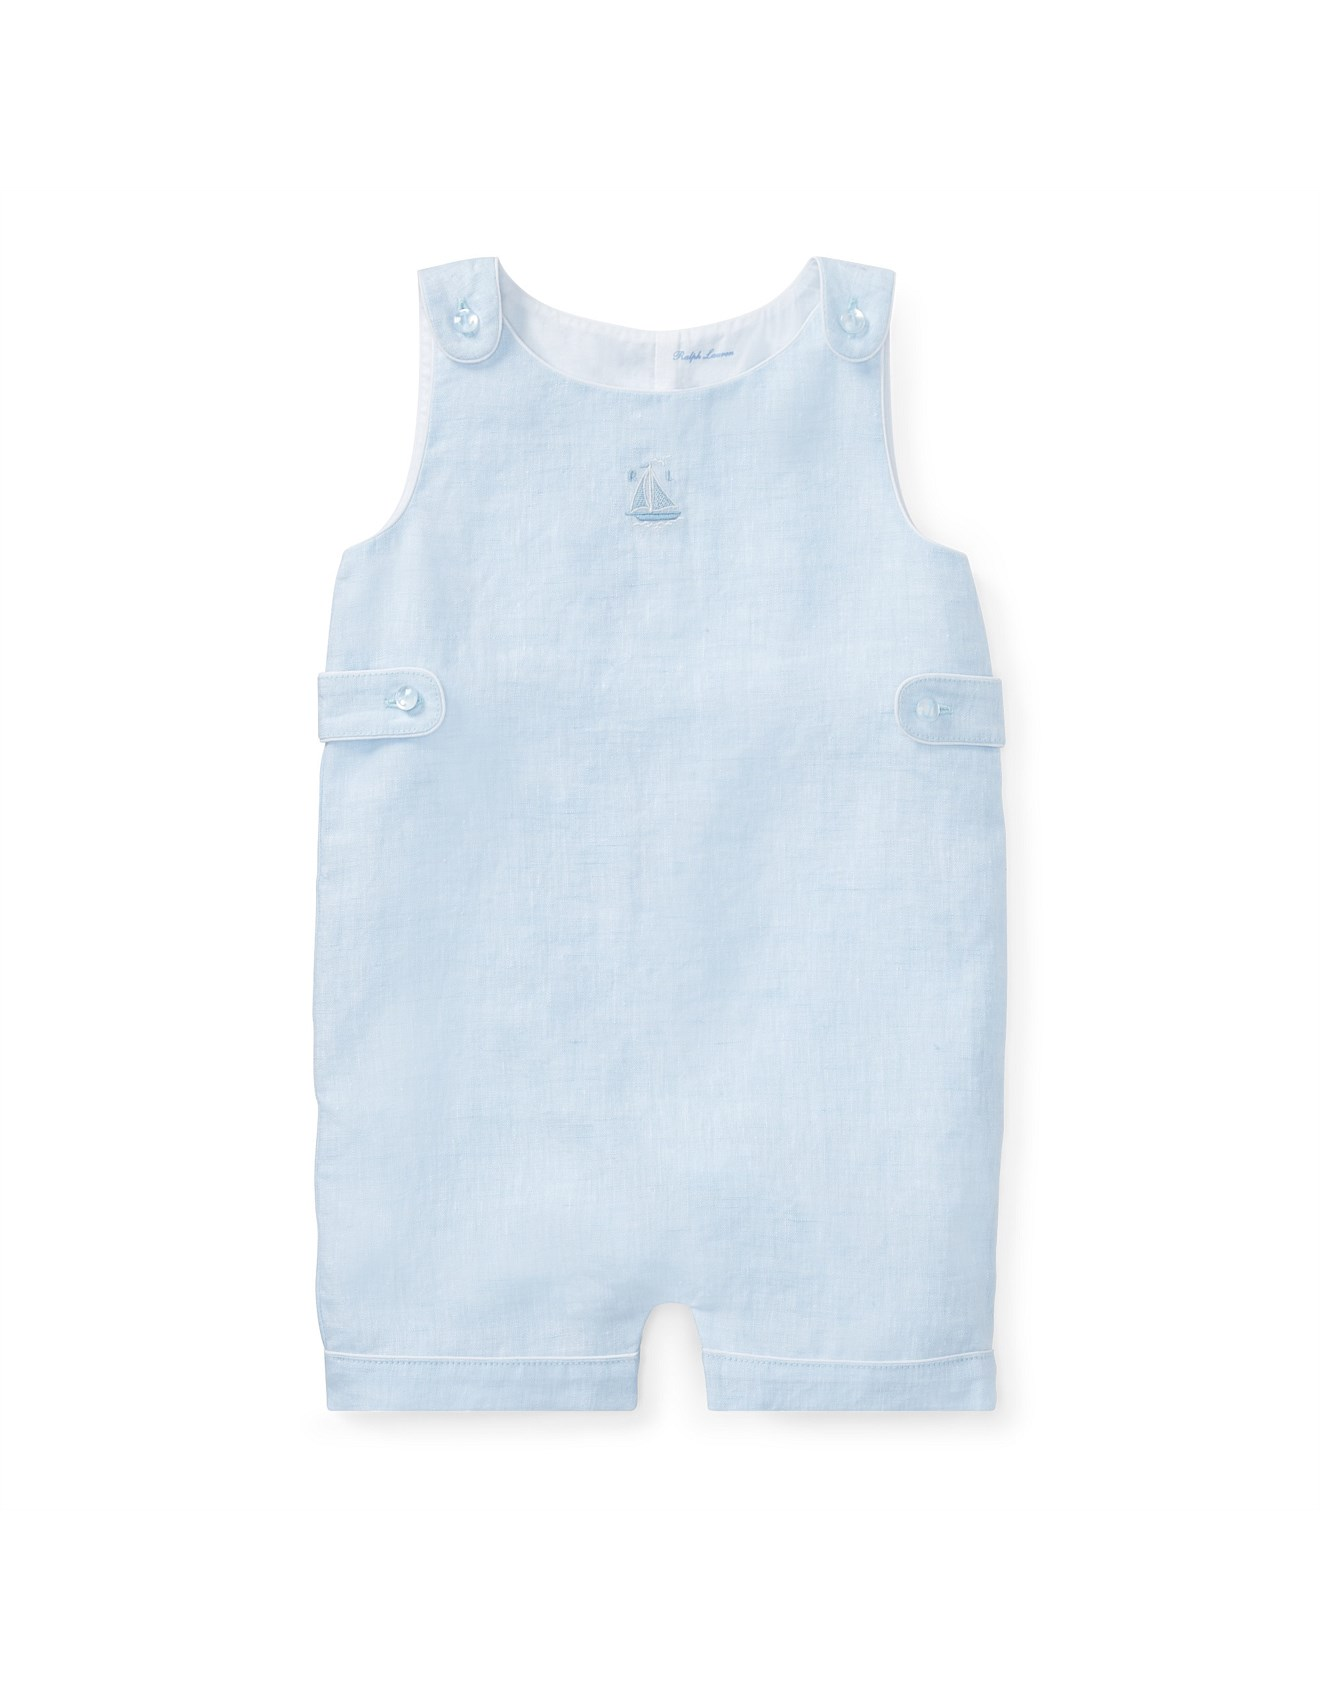 9661d57ea Baby Clothing Sale | Buy Baby Clothes & Accessories | David Jones ...